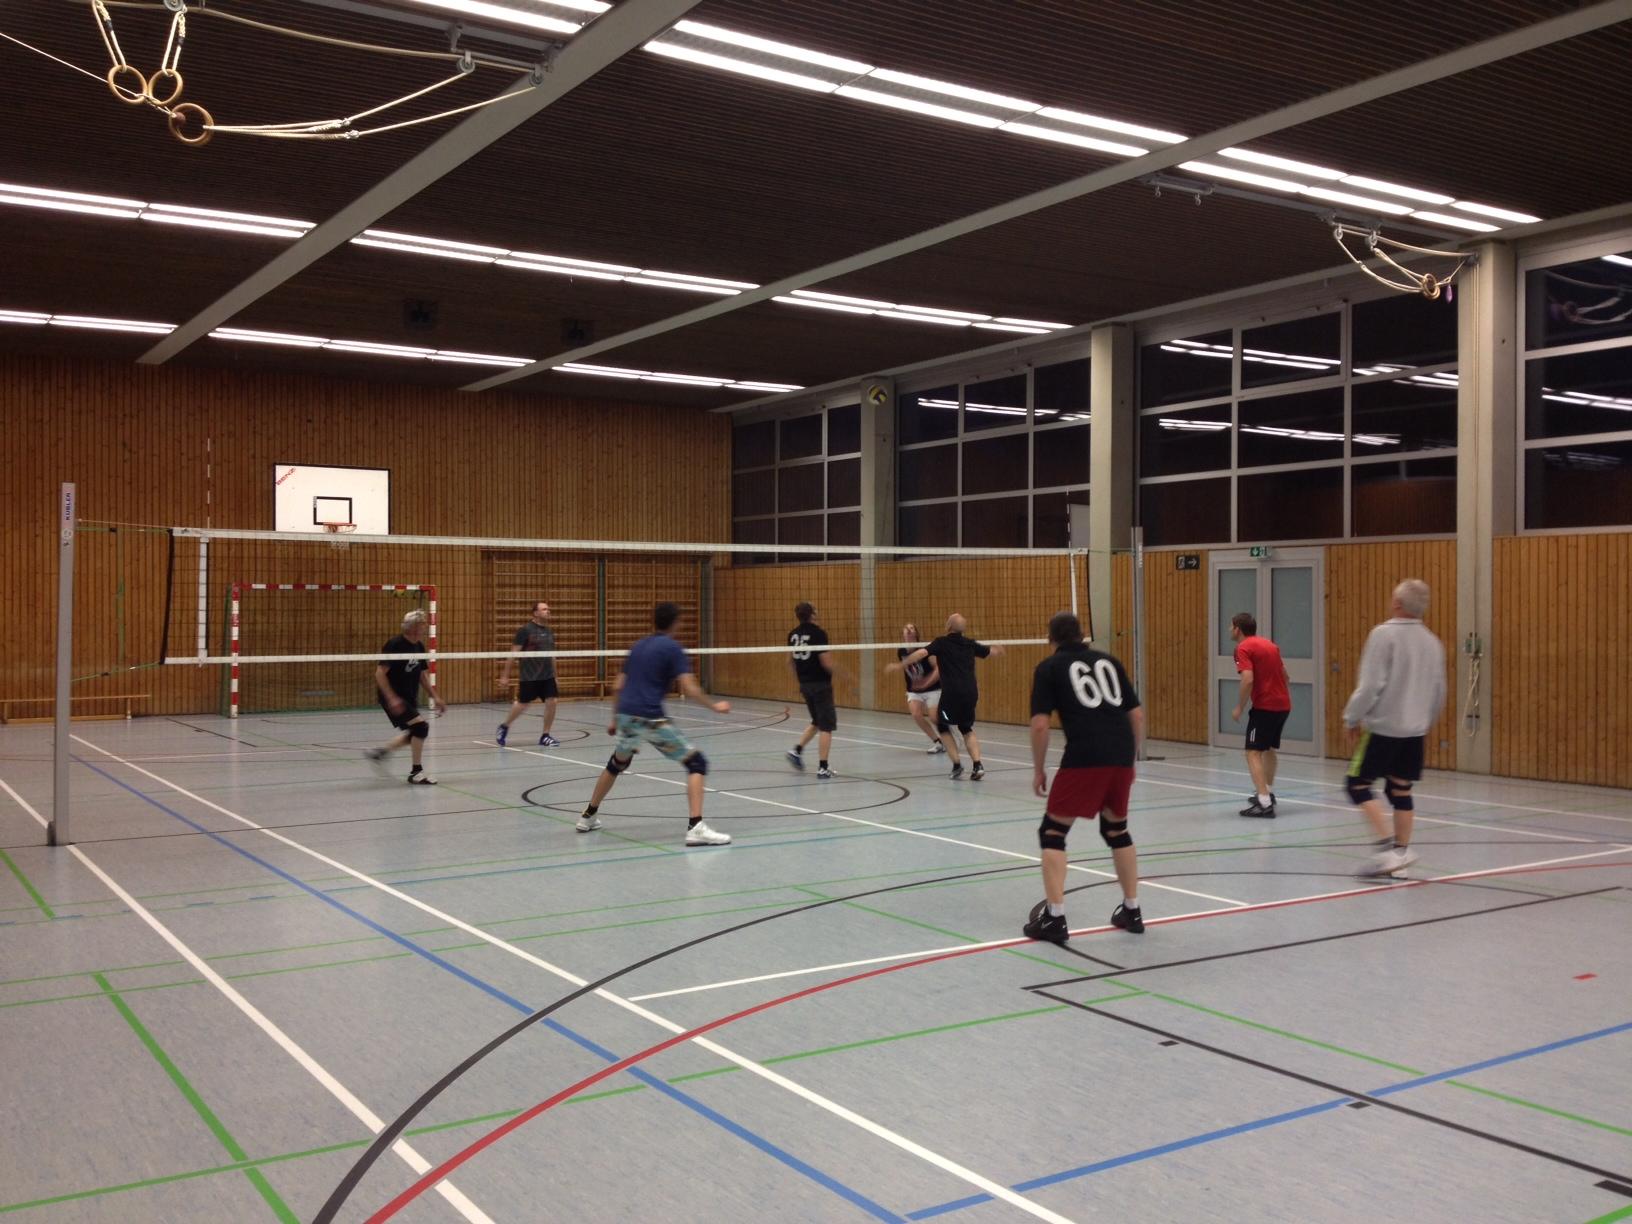 http://user.web-gear.com/sportverein-wippingen/Volley_2.jpg